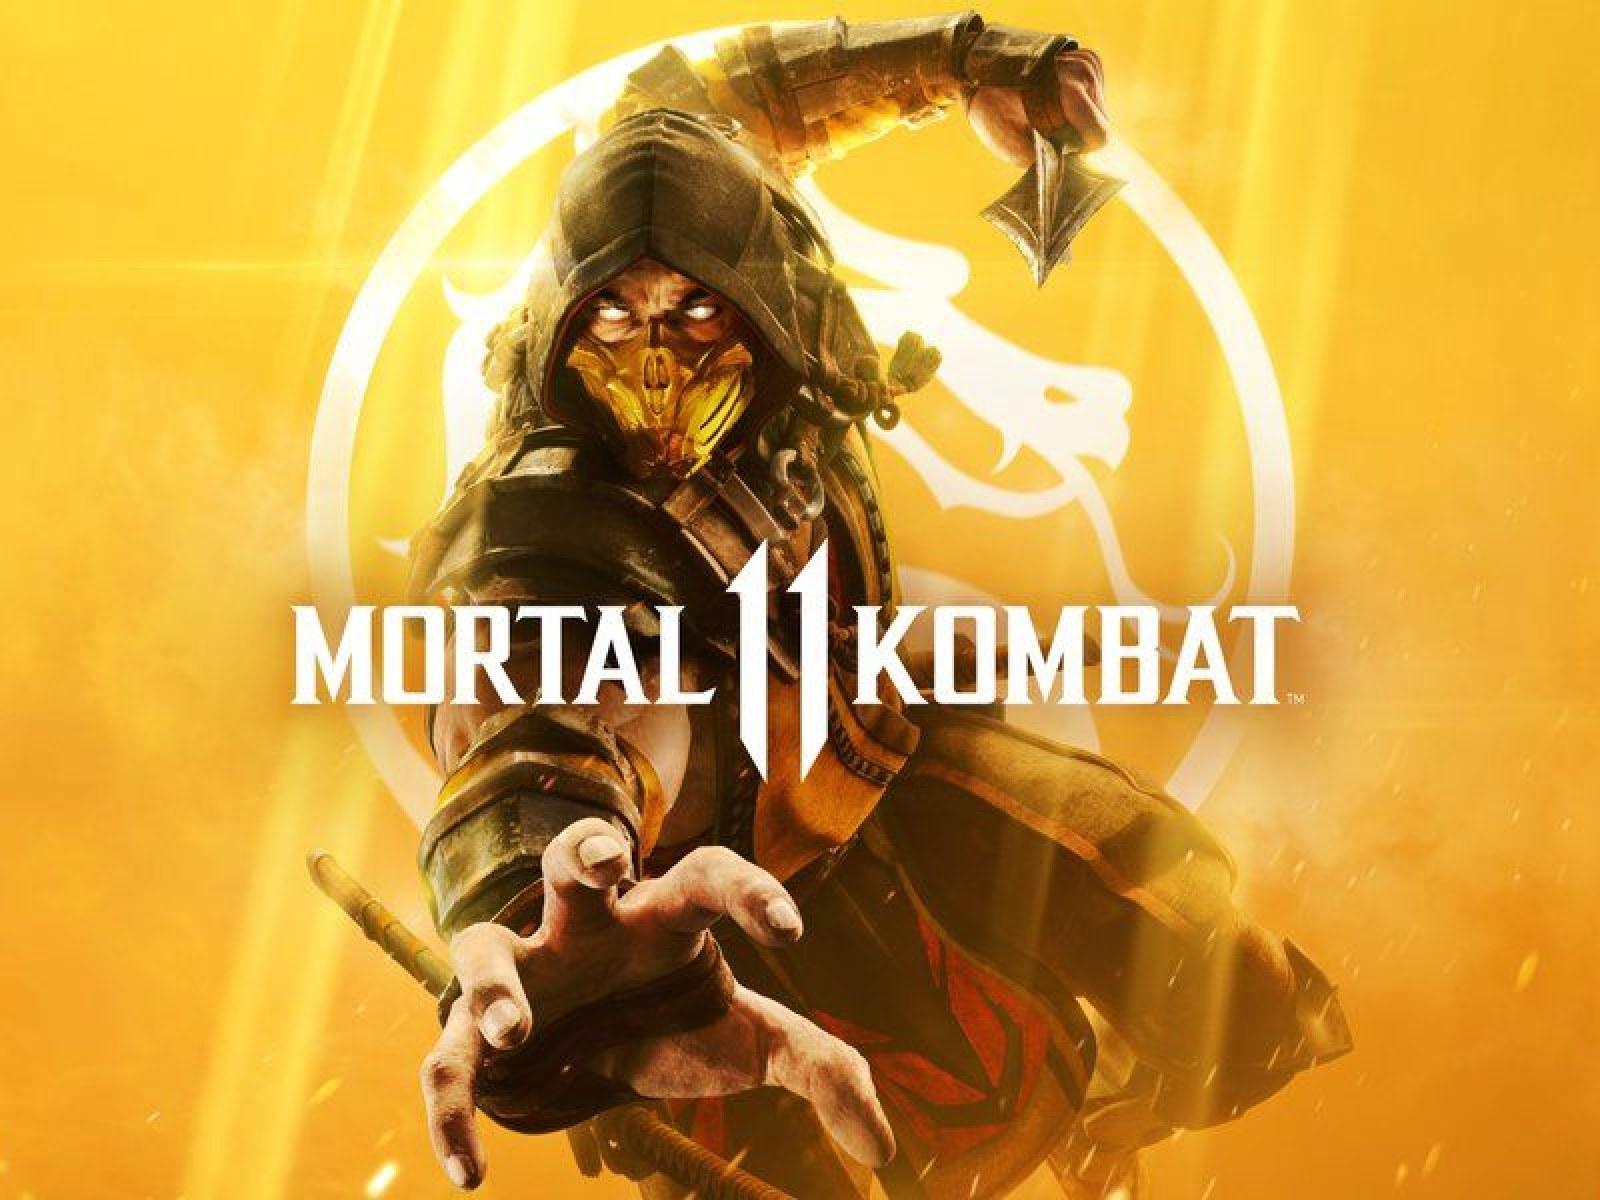 Mortal Kombat 11 Cover Reveals Scorpion In His Fiery Glory